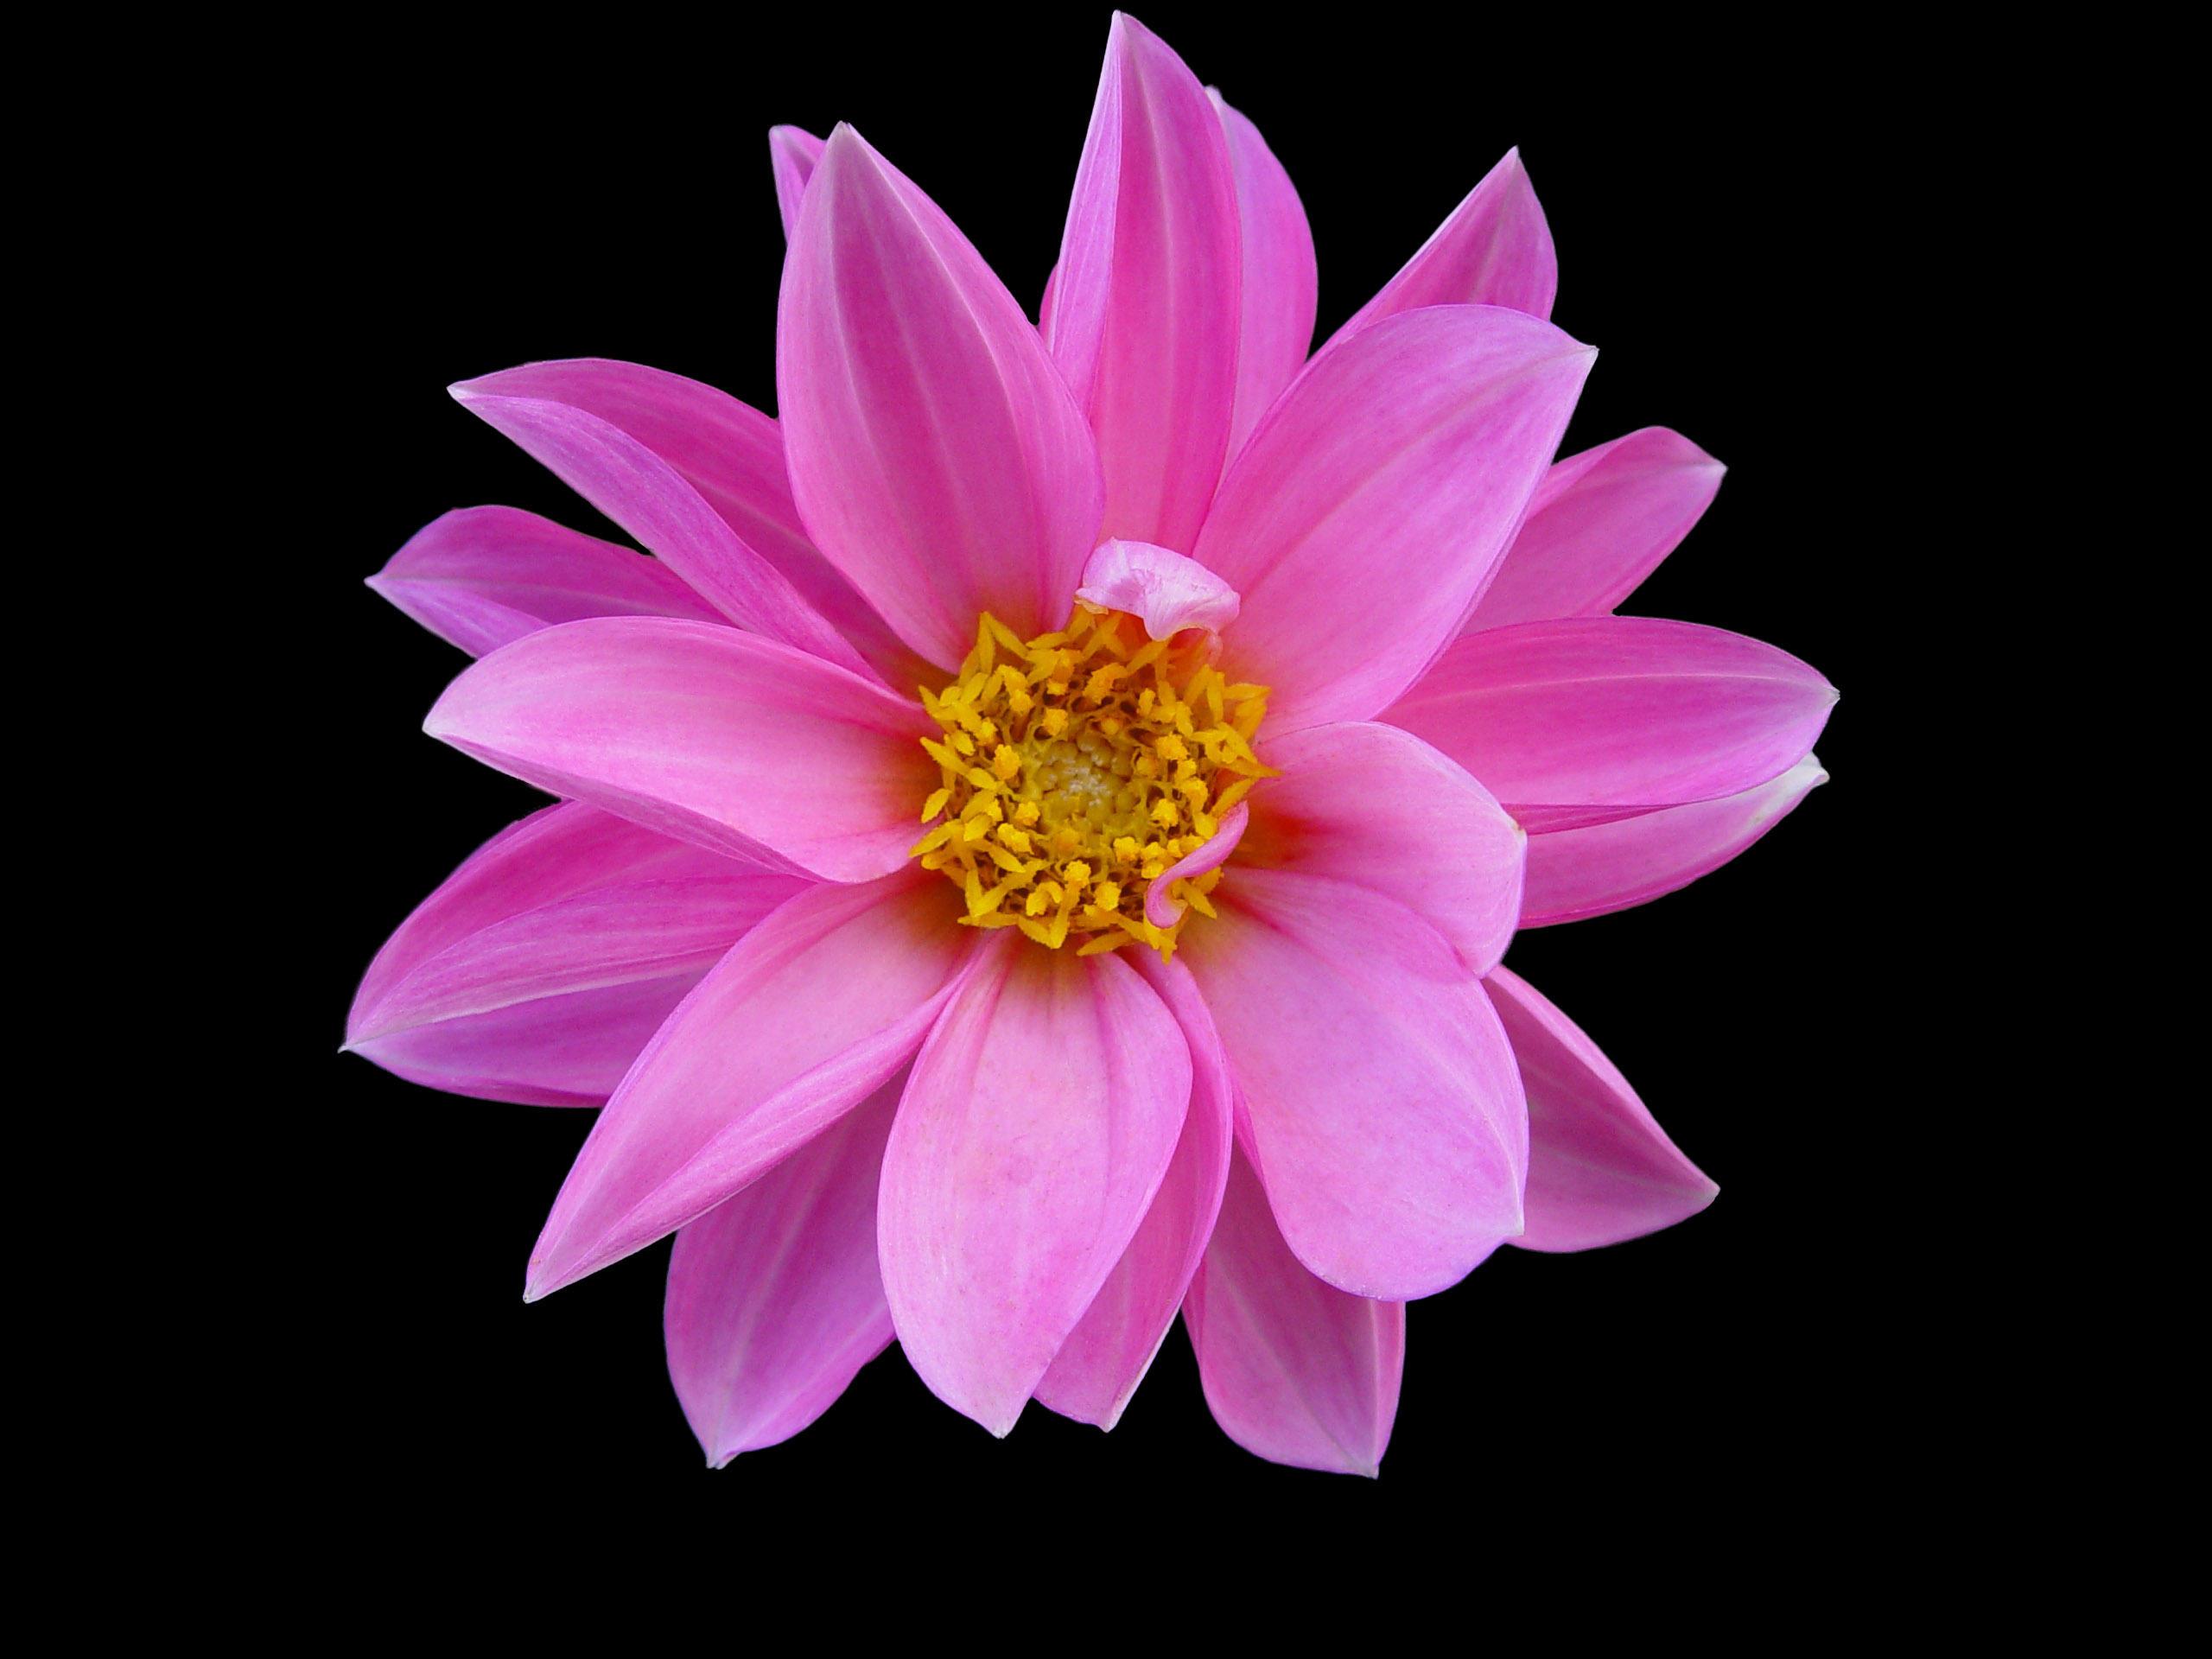 pink flower by livinus pink flower by livinus